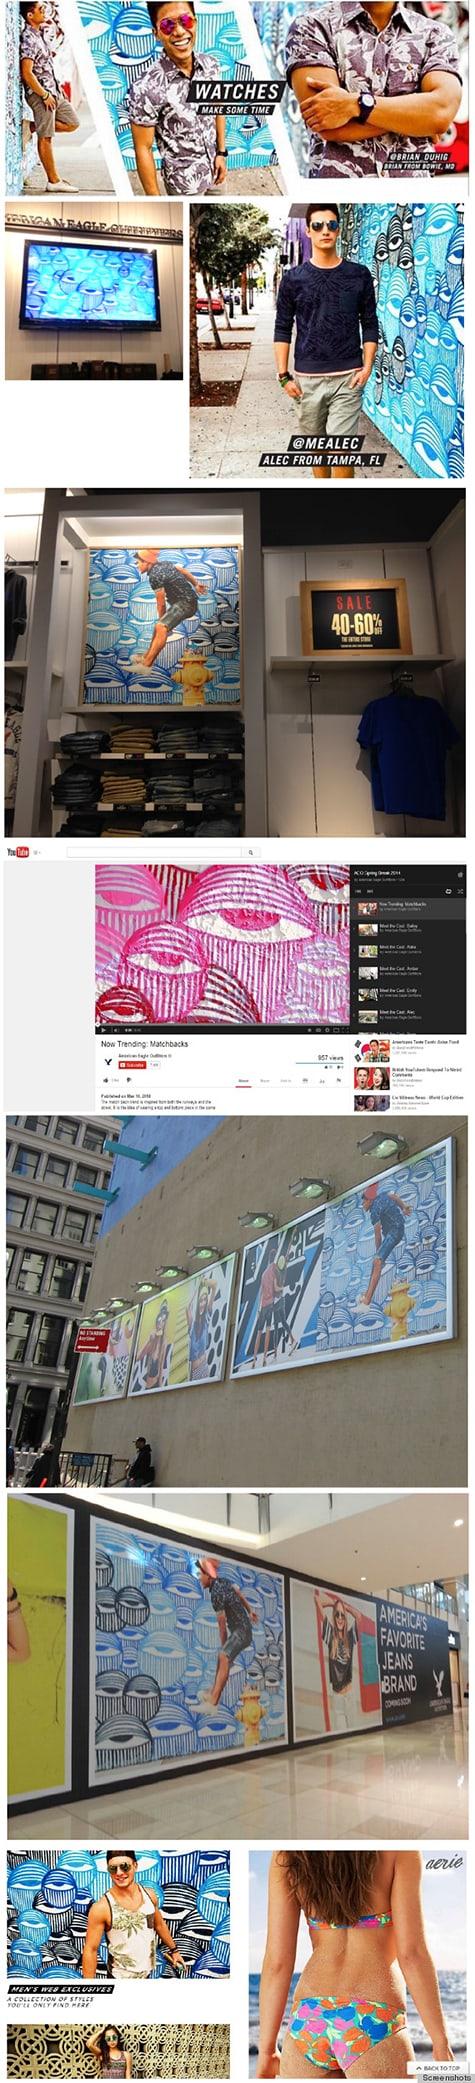 https://www.ashley-spencer.com/ArtIsEverywhere/wp-content/uploads/2014/07/Huffington-Post_AMERICAN-EAGLE-AHOL-SNIFFS-GLUE-images.jpg